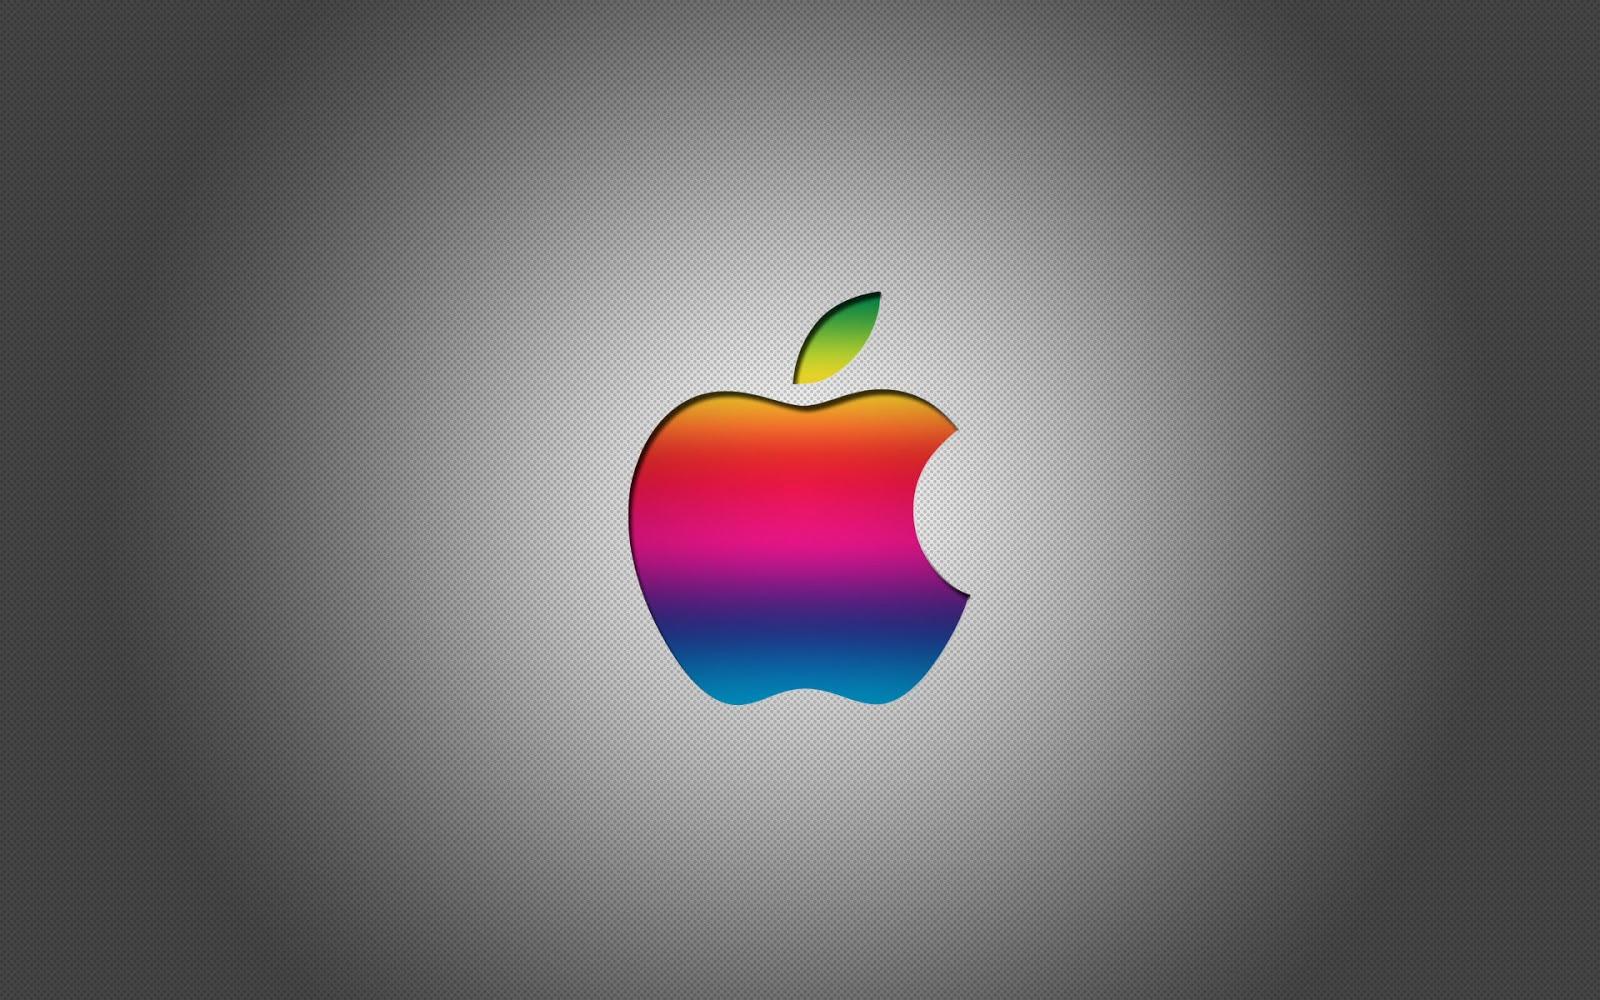 download wallpaper hd laptop apple